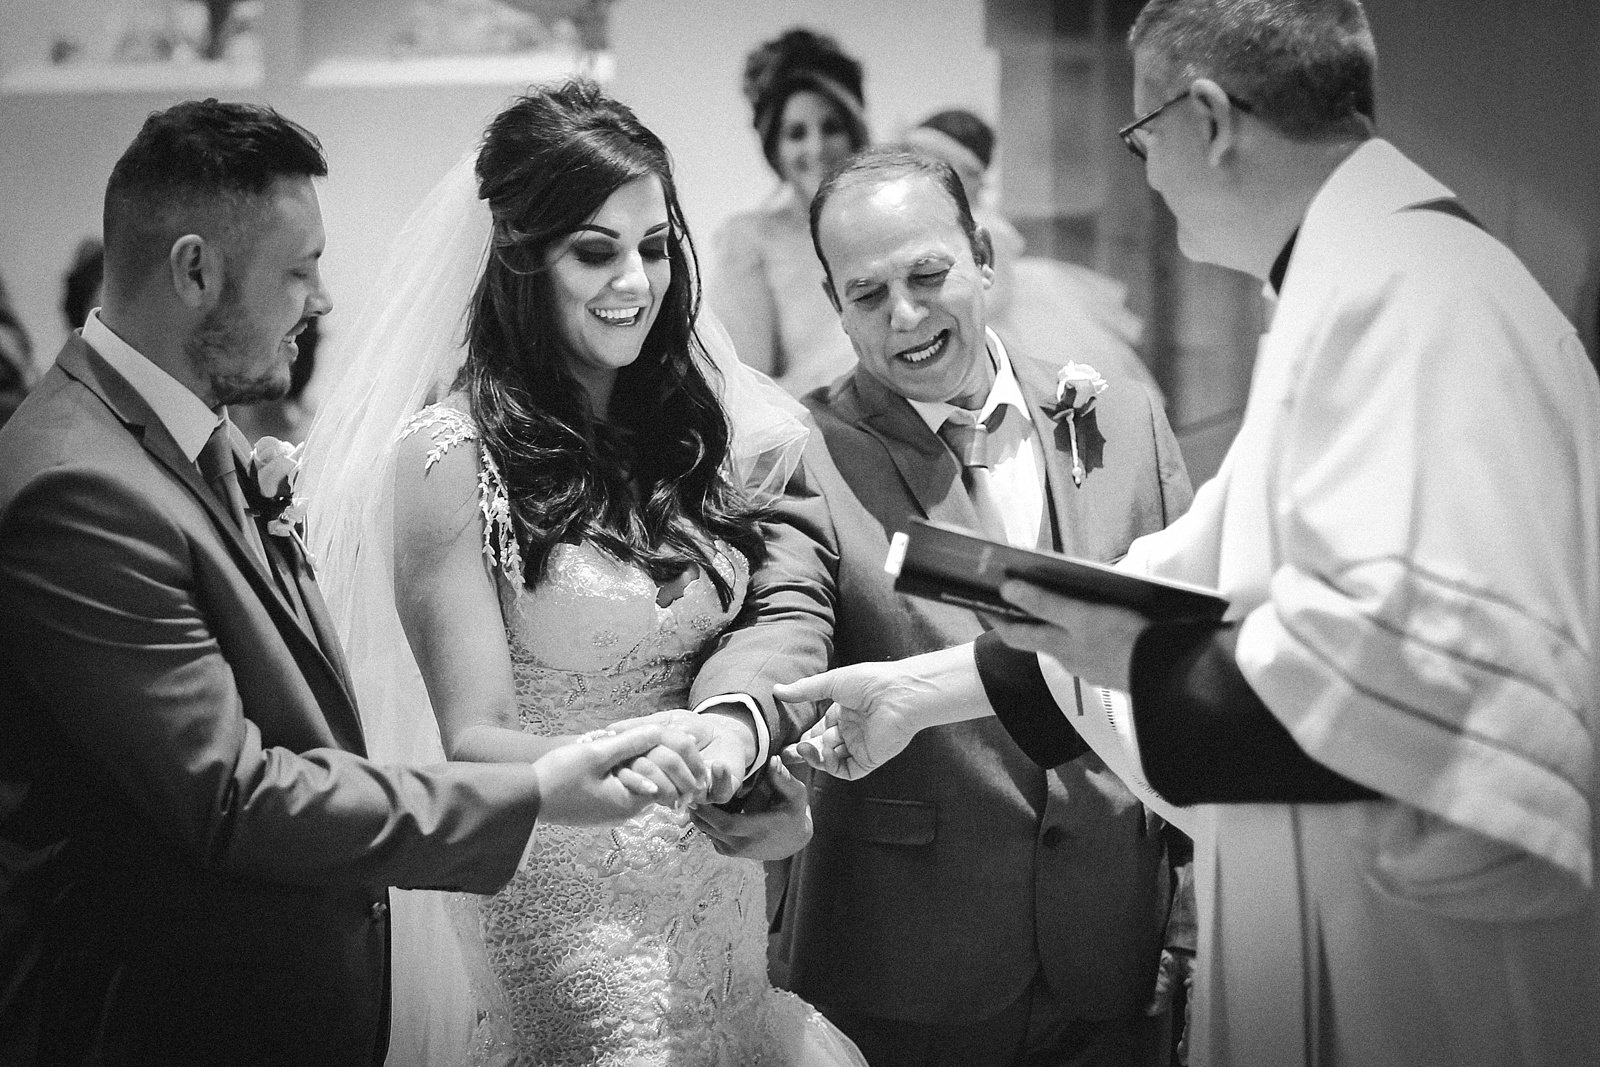 Galia lahav haute couture Giselle dress - West Tower Wedding Photography by Lancashire wedding Photographer Wes Simpson_0019